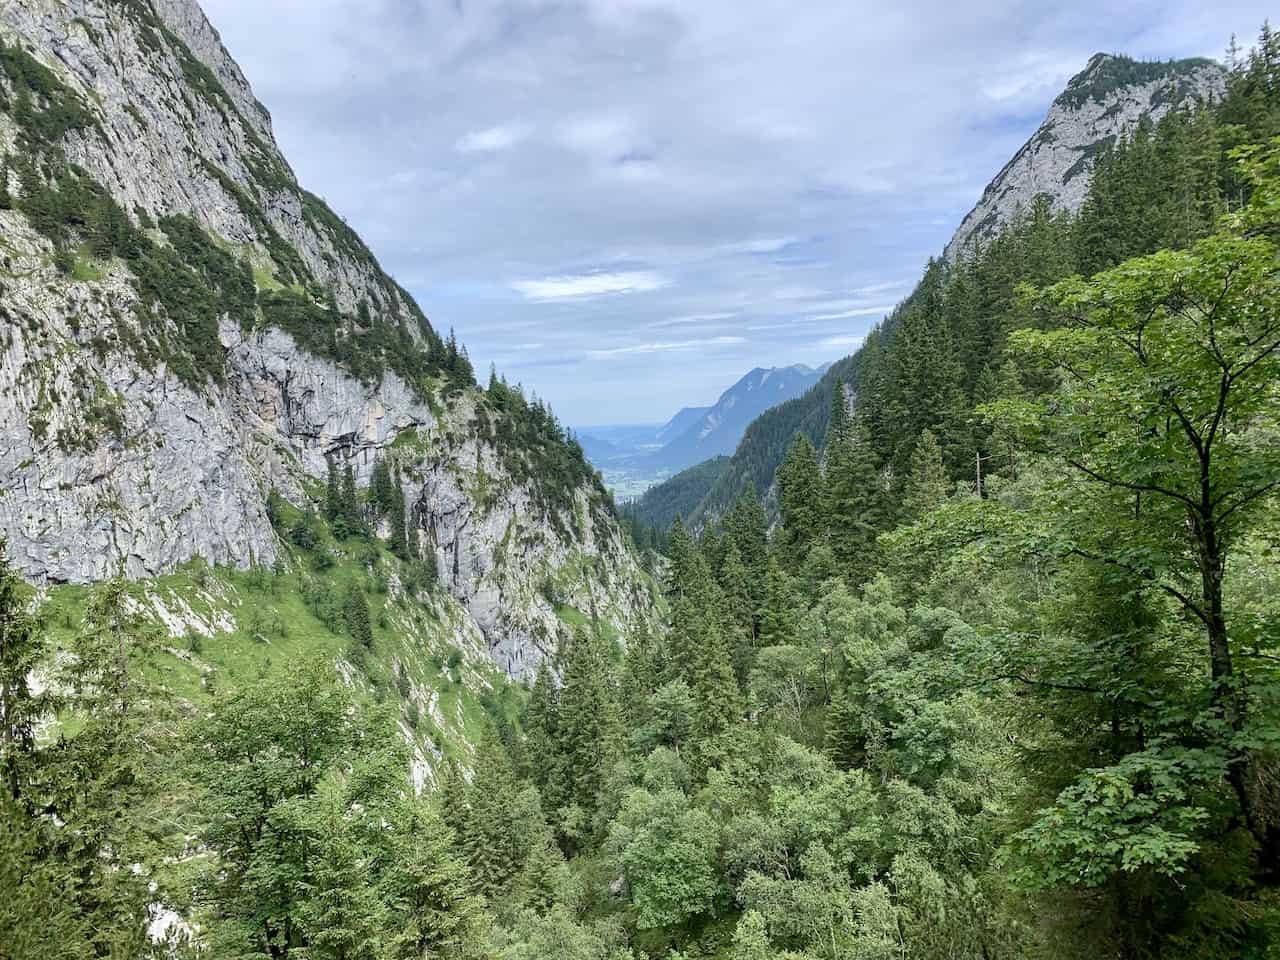 Hollental Valley Hike